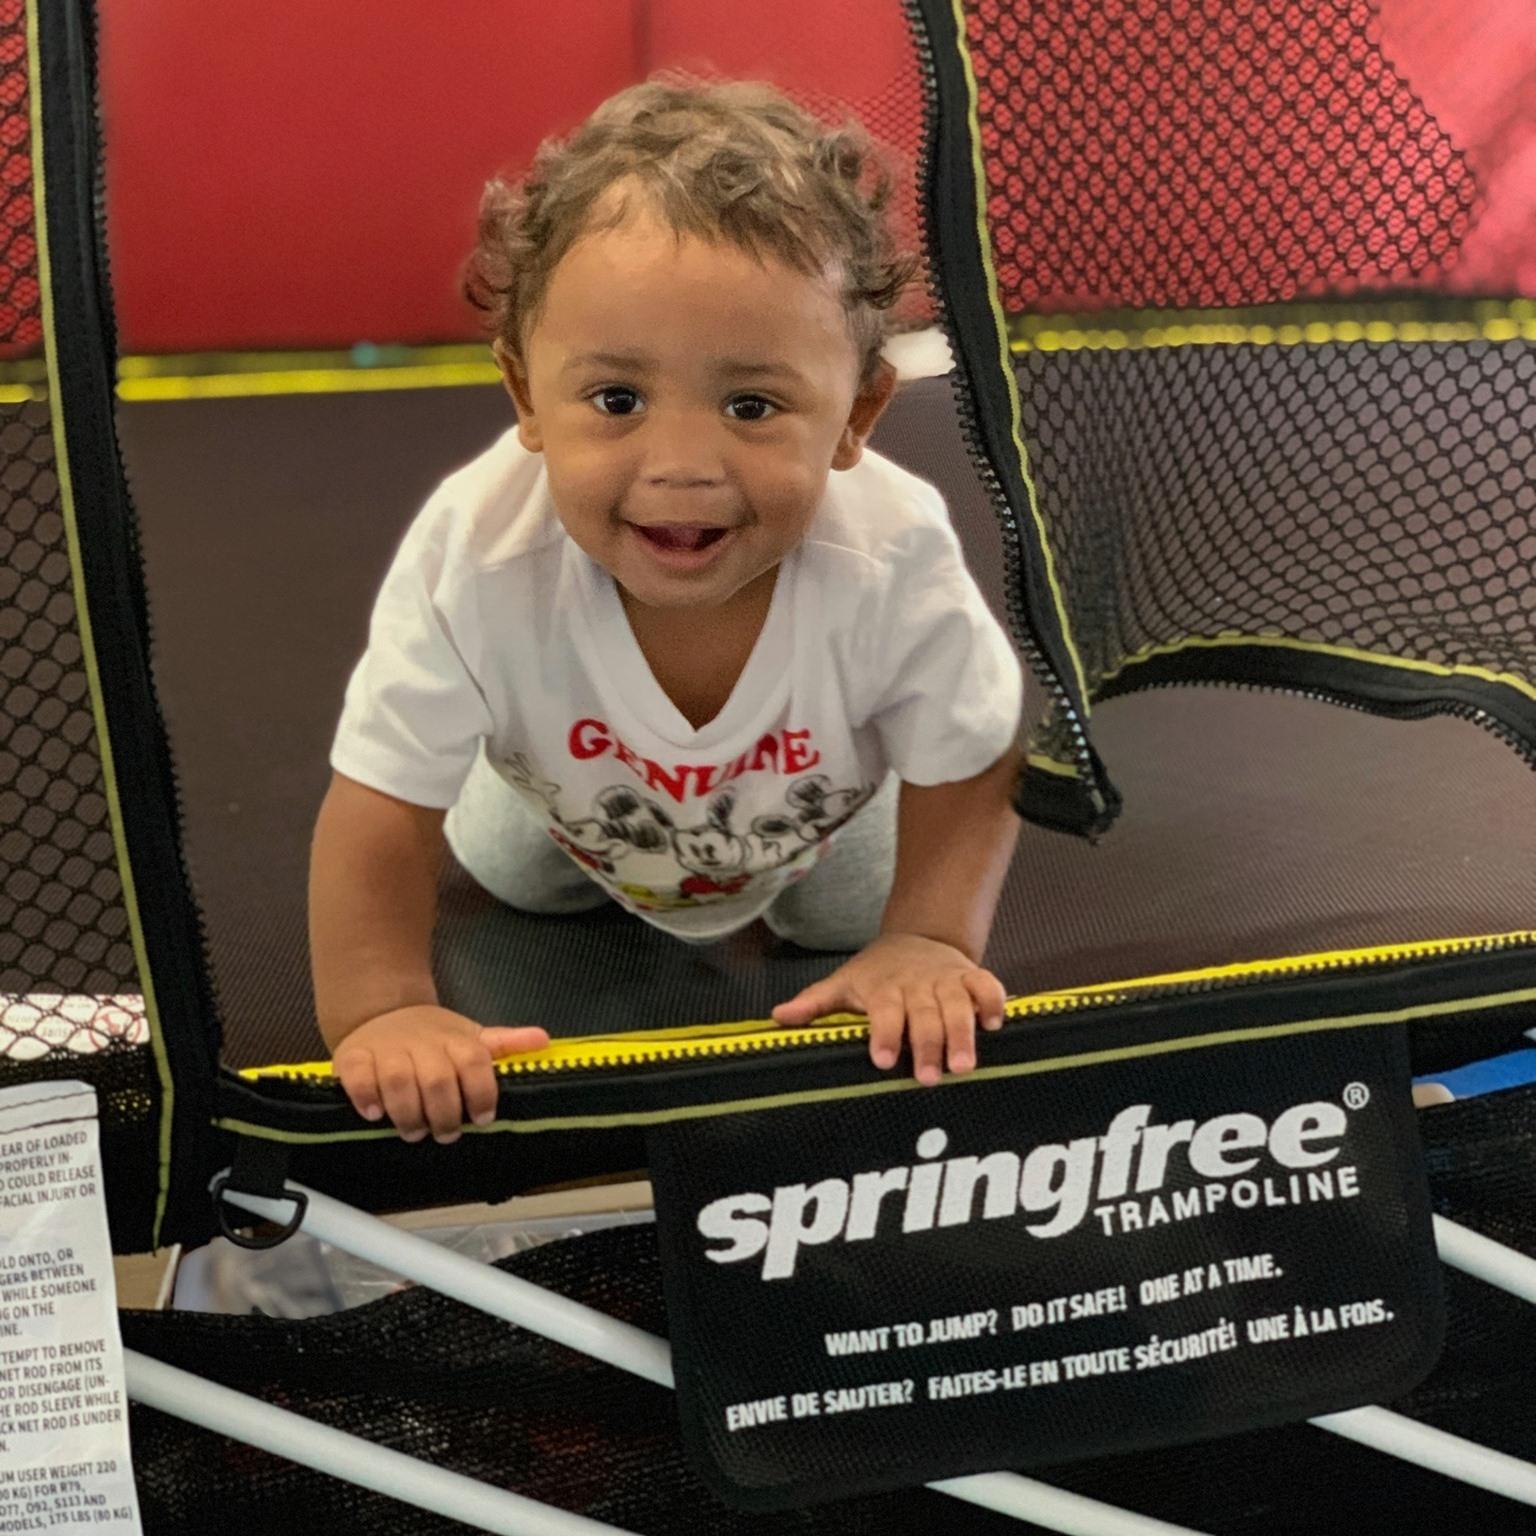 WRTS NE Philly Re-Opening - Springfree Trampoline